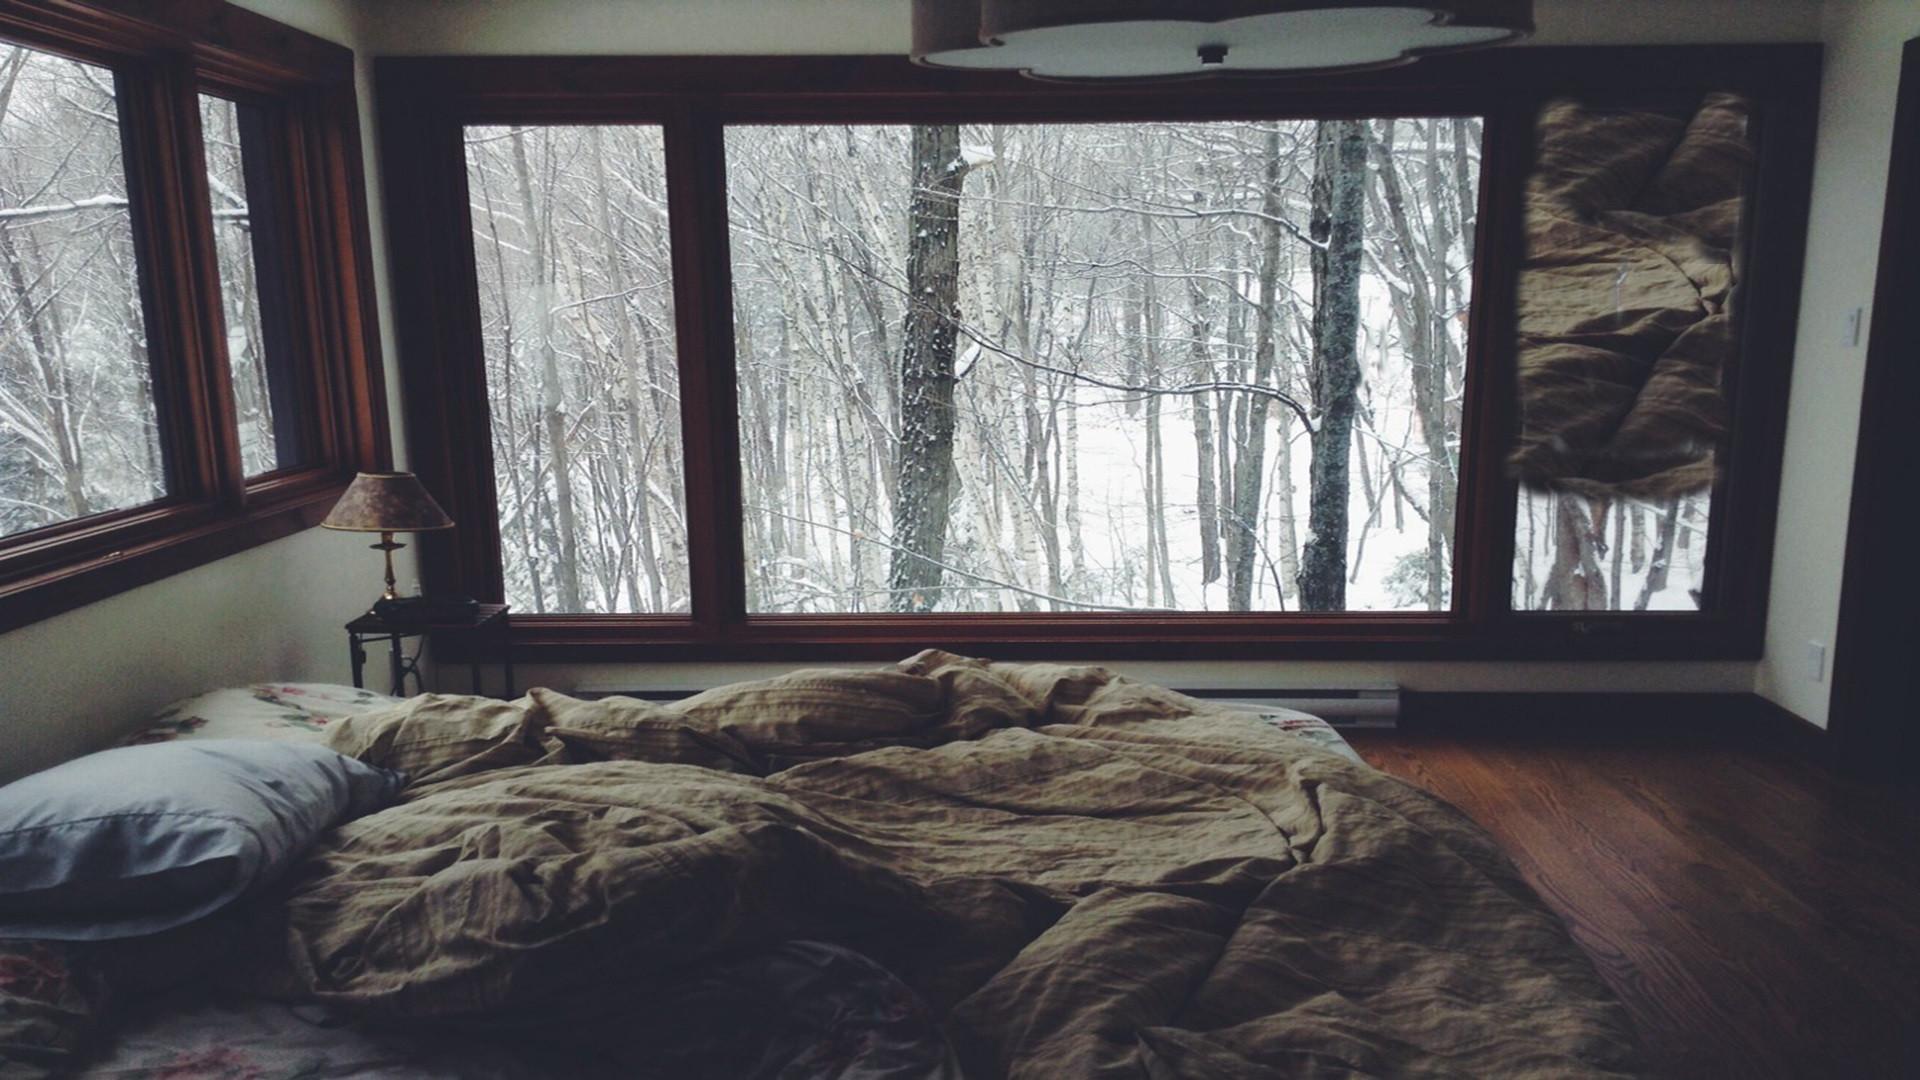 cozy winter wallpaper :3 - Imgur